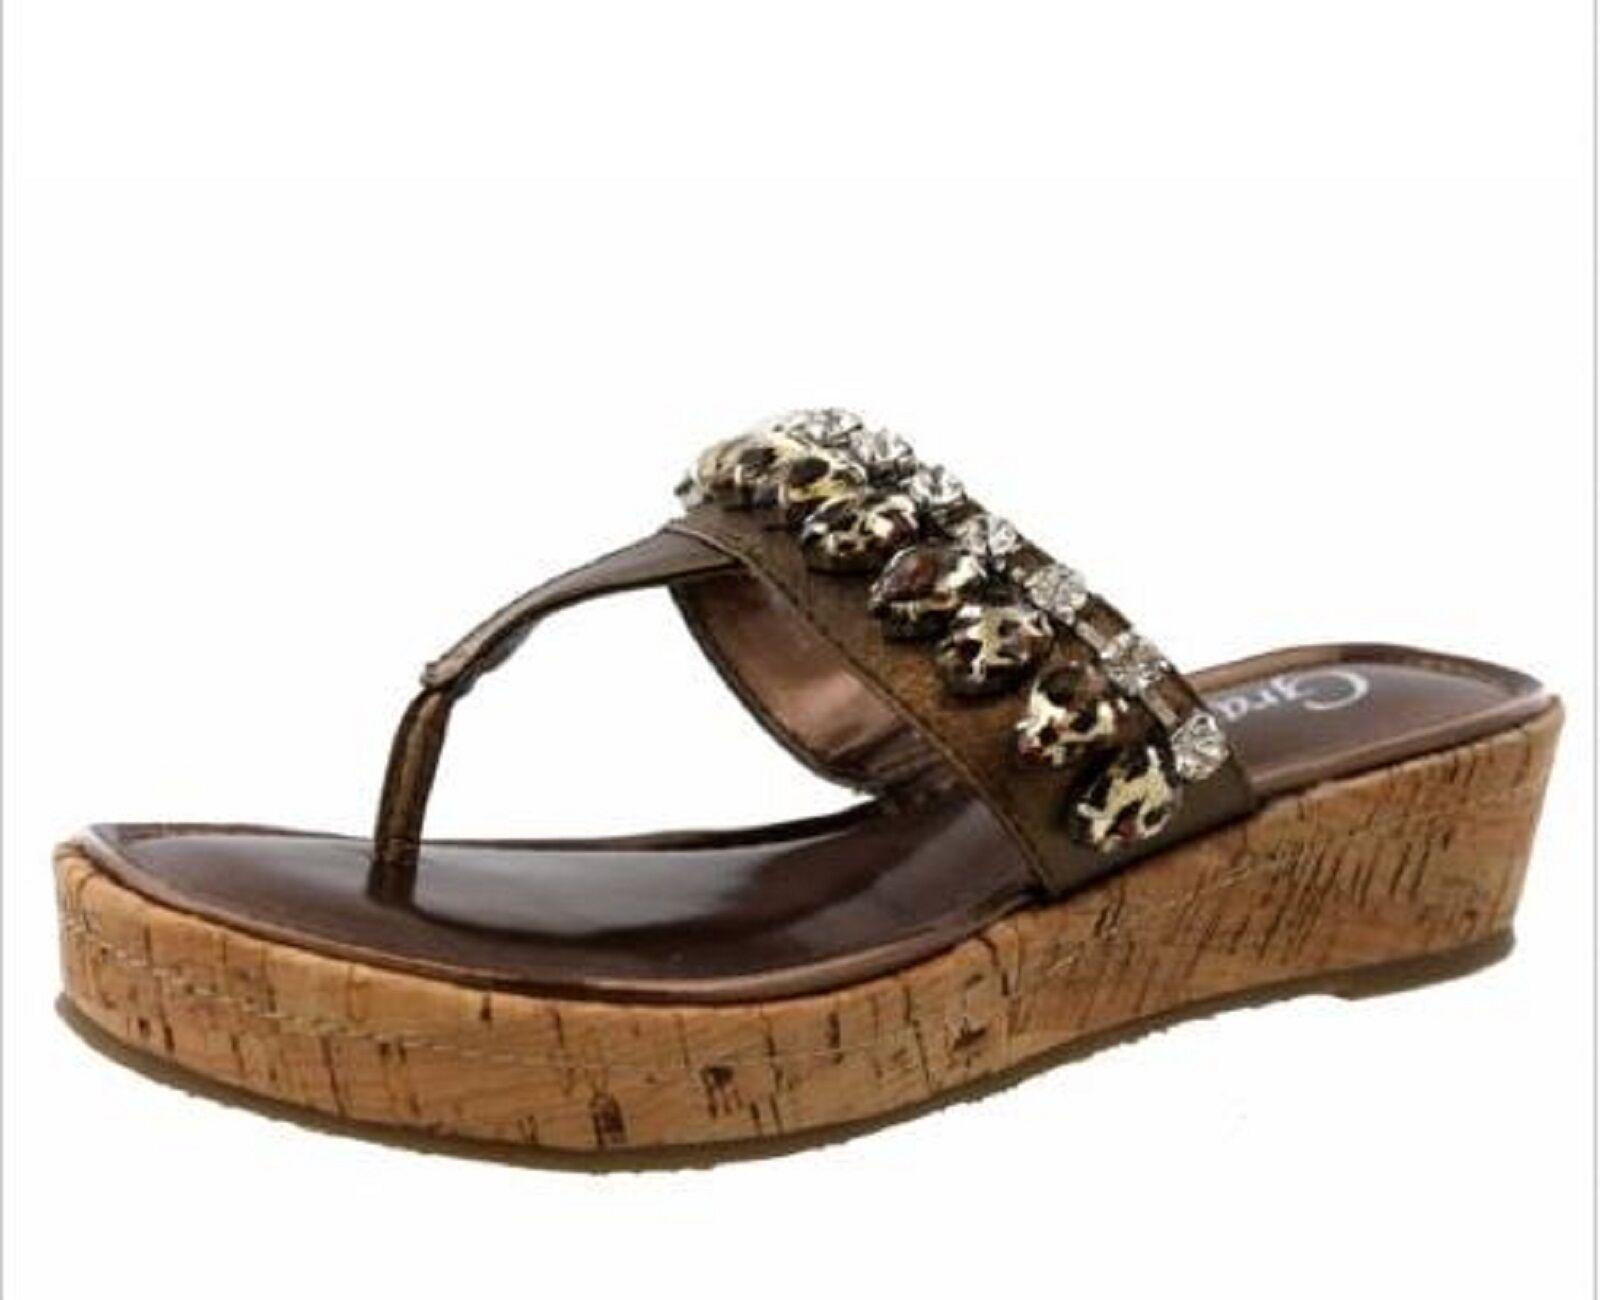 Sanuk Yoga Mat - Cushioned Sandals - Women's Ebony - 9